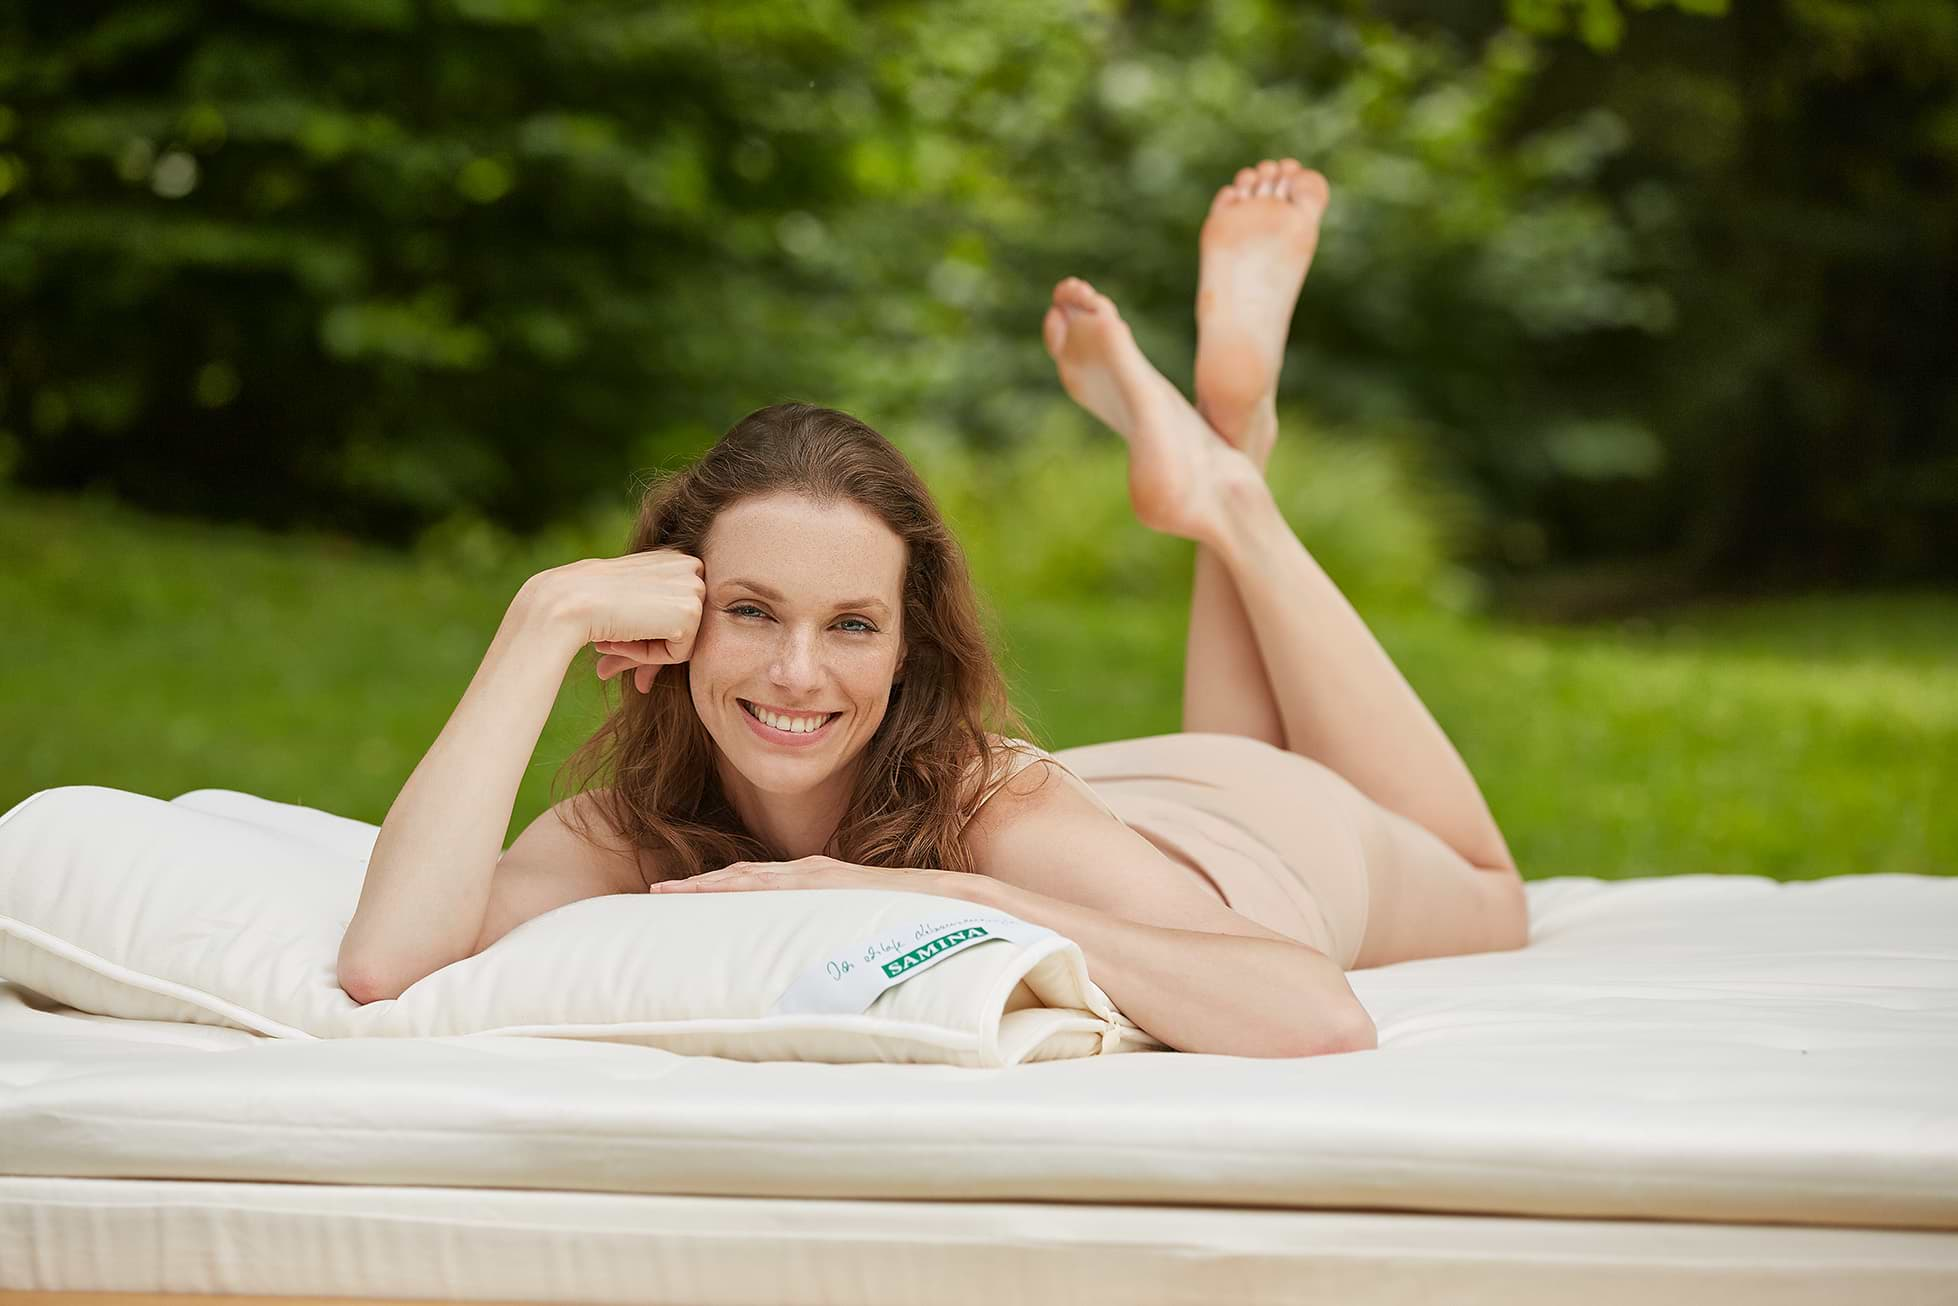 Samina Sleep – Get your best sleep ever